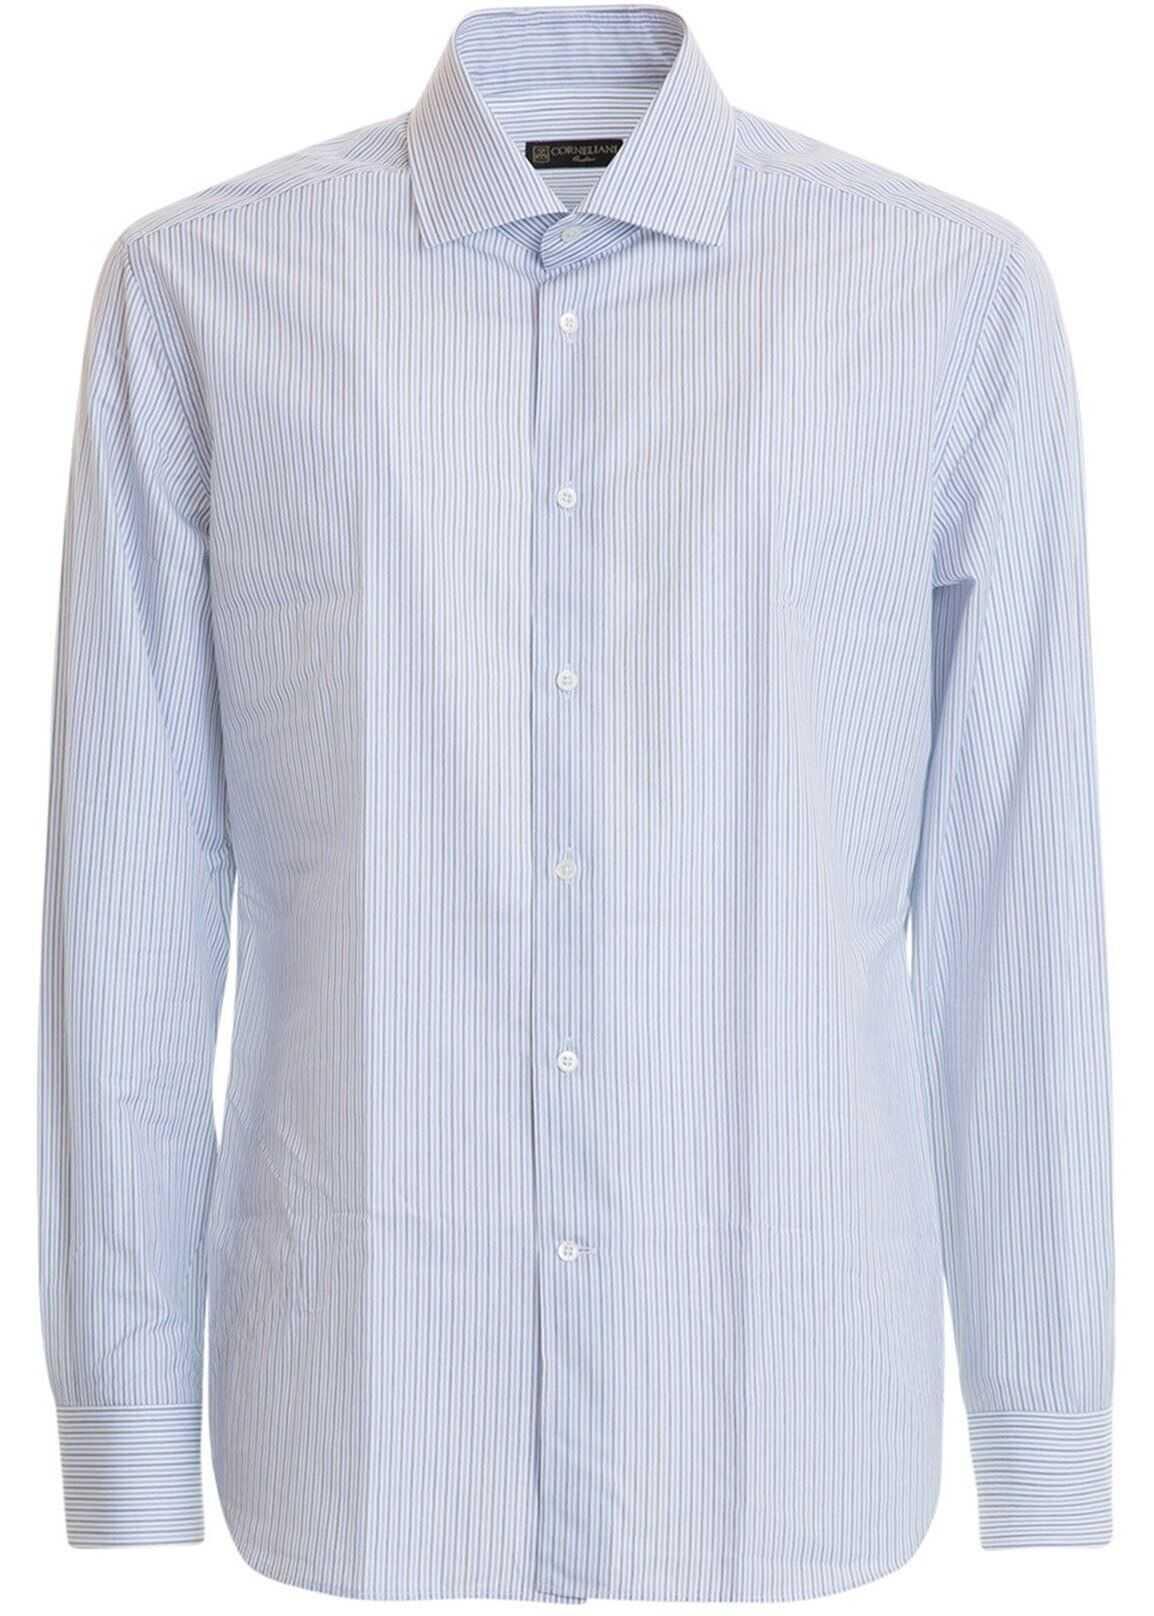 CORNELIANI Striped Cotton Poplin Shirt In Light Blue Light Blue imagine